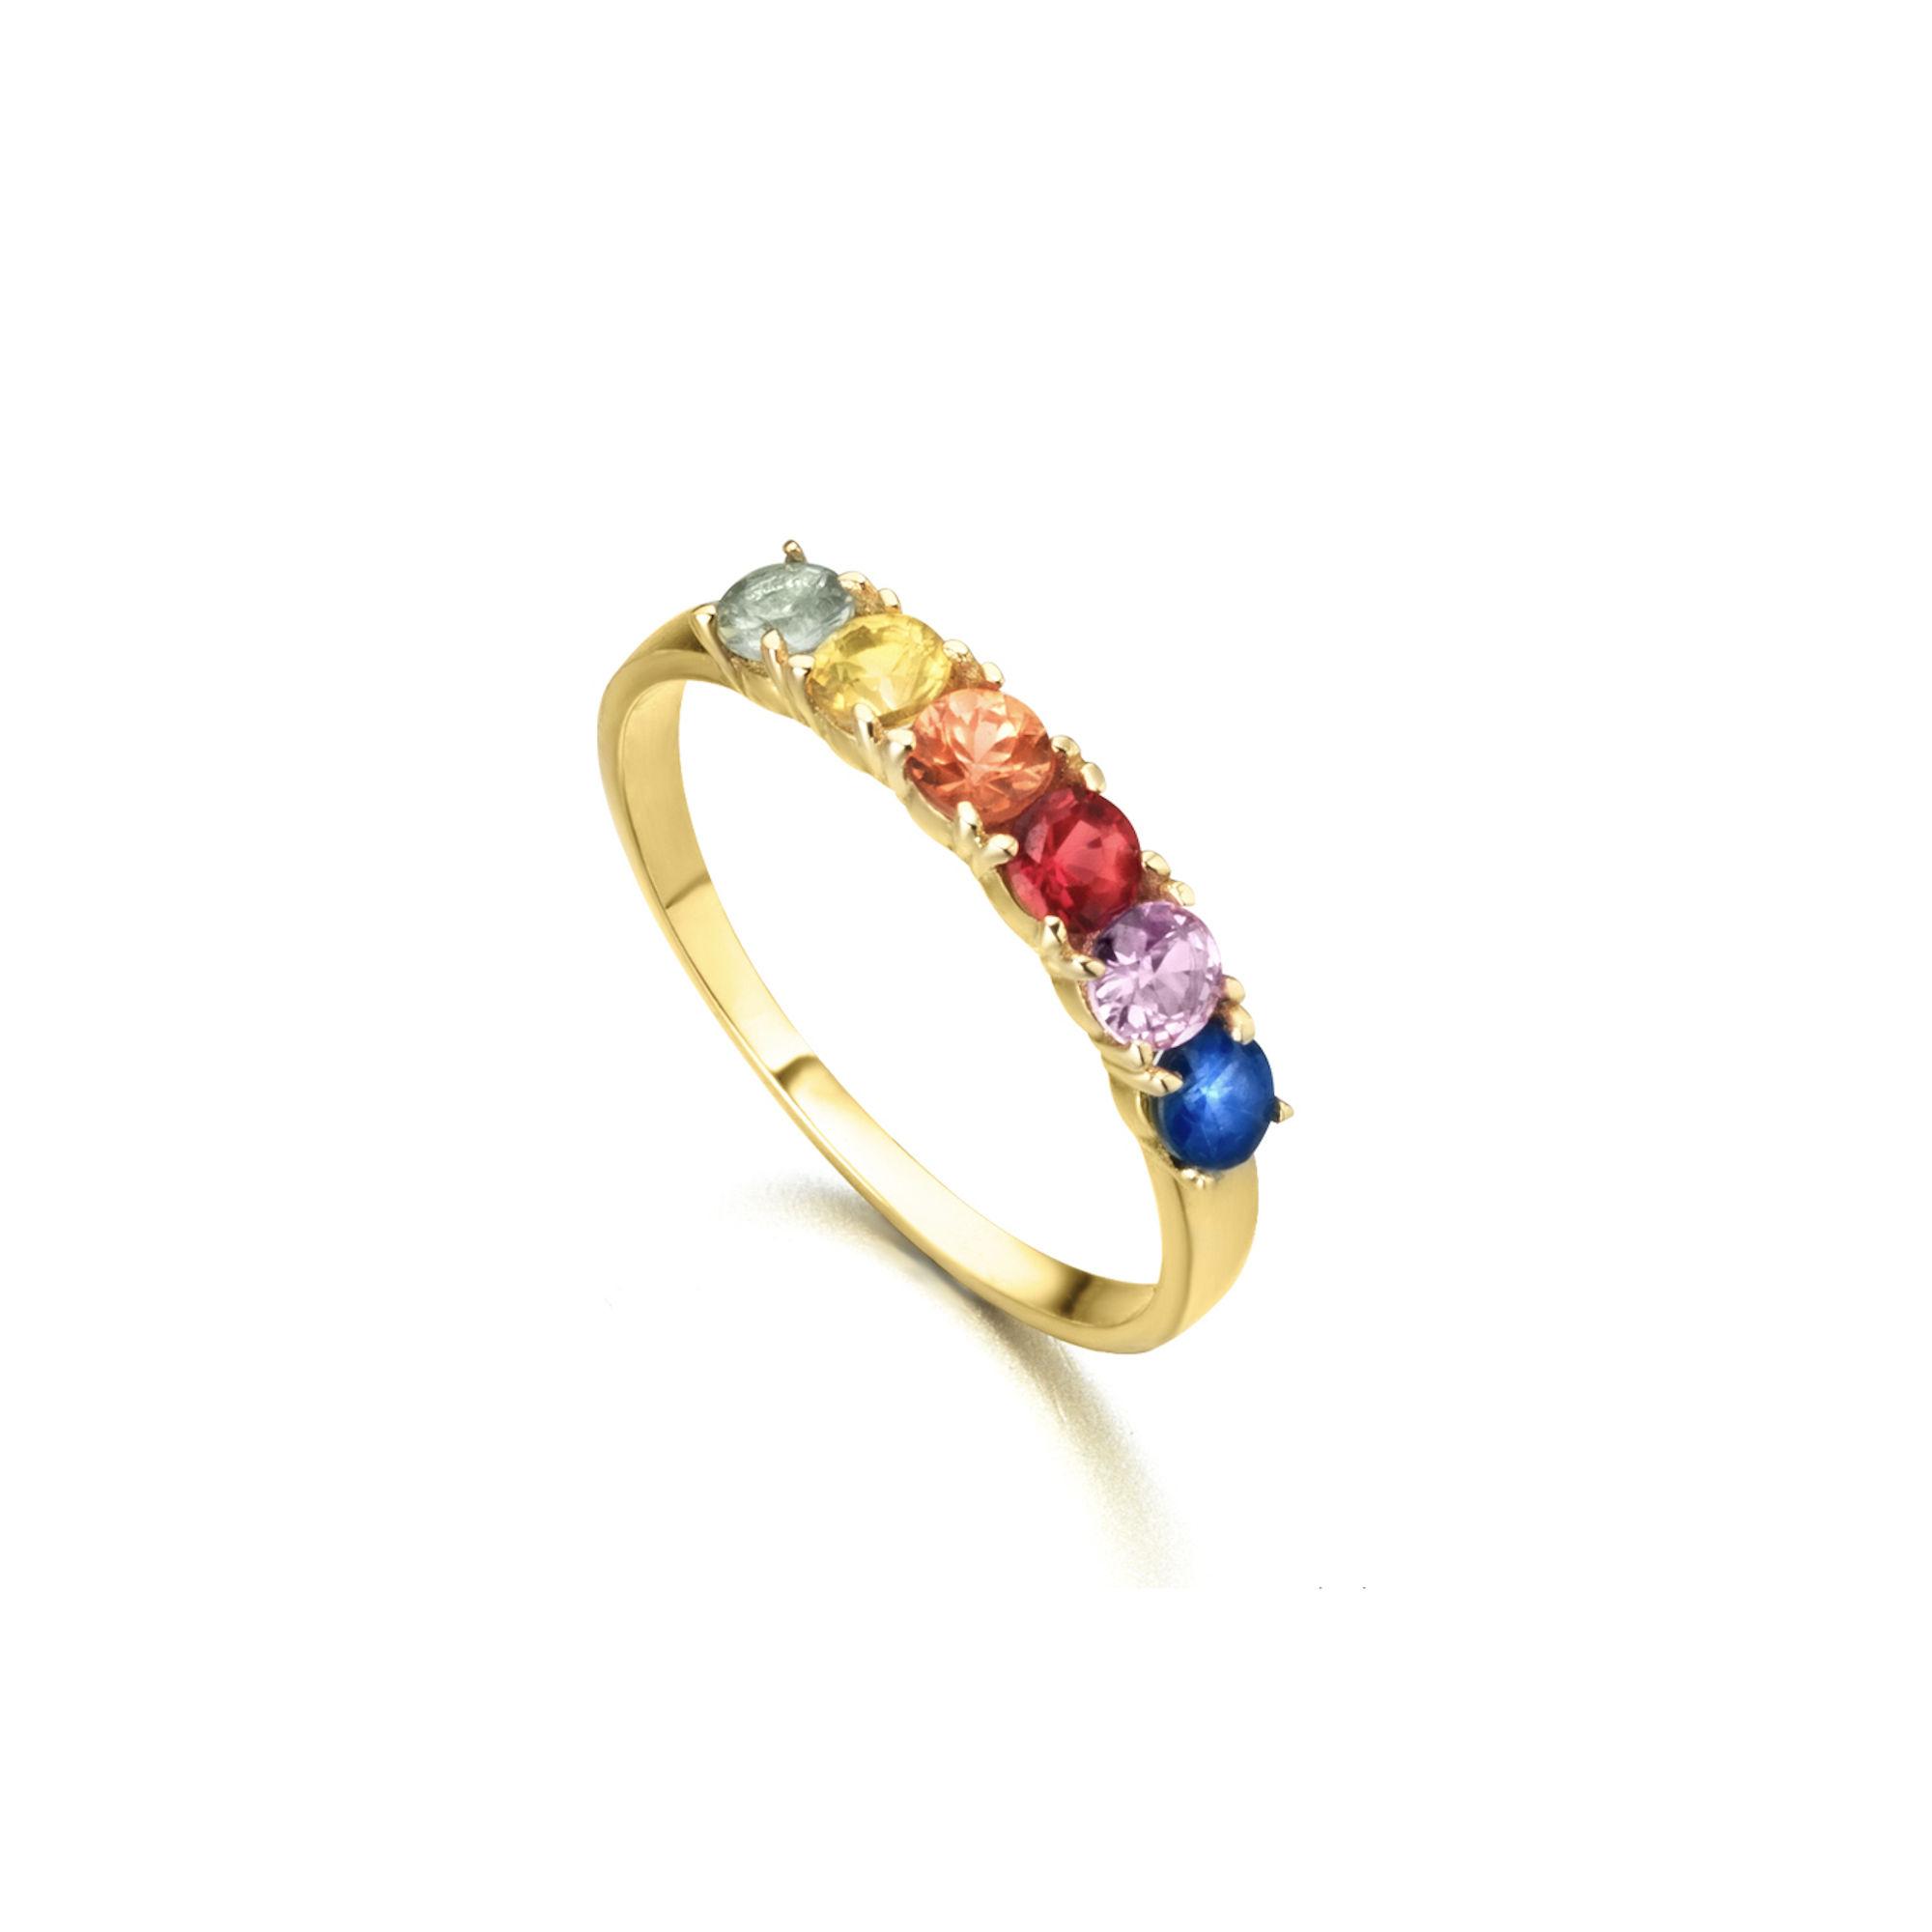 LE CARRÈ anello zaffiri multicolor ring engagement sapphires discount sconto